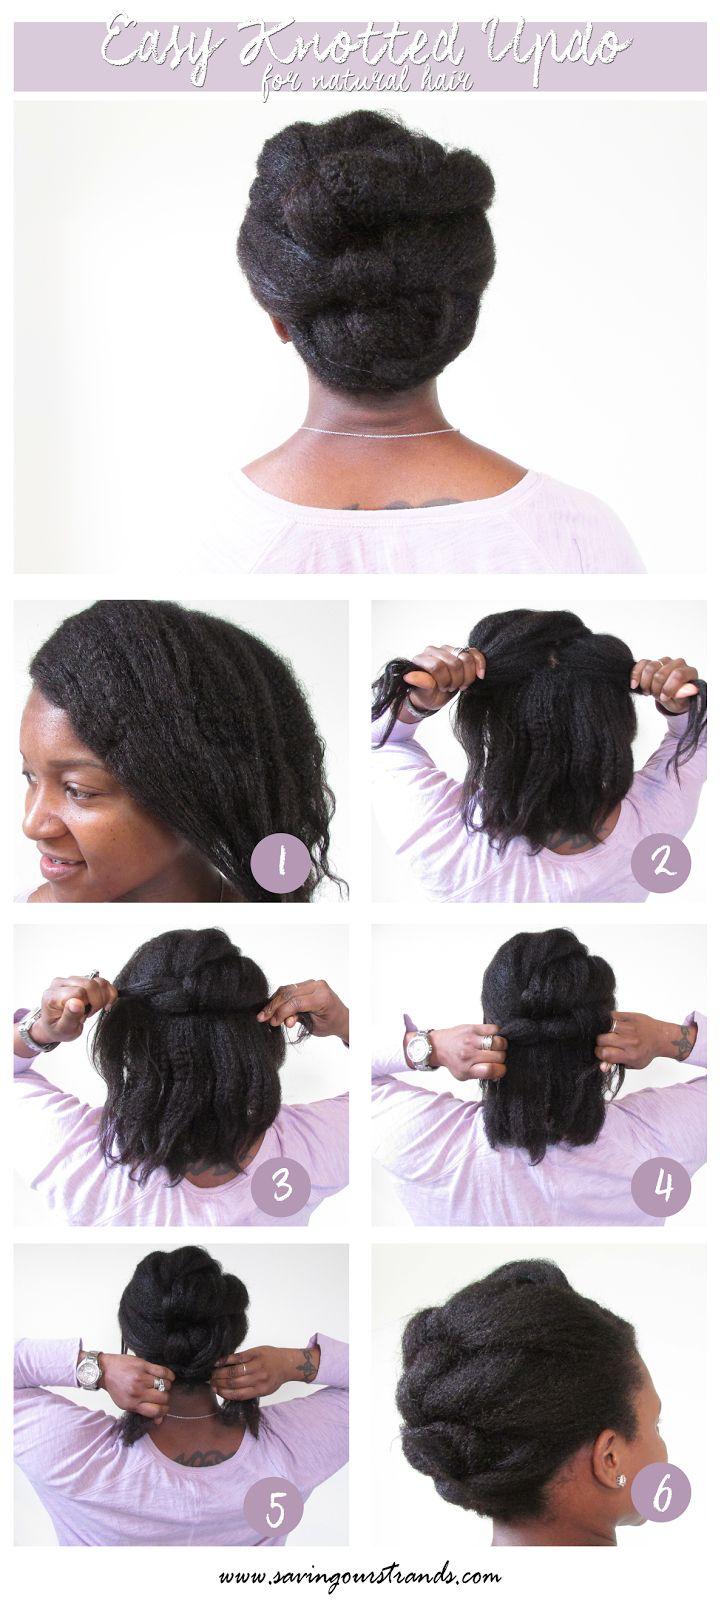 SavingOurStrands A Healthy Hair Quest Tutorial Easy